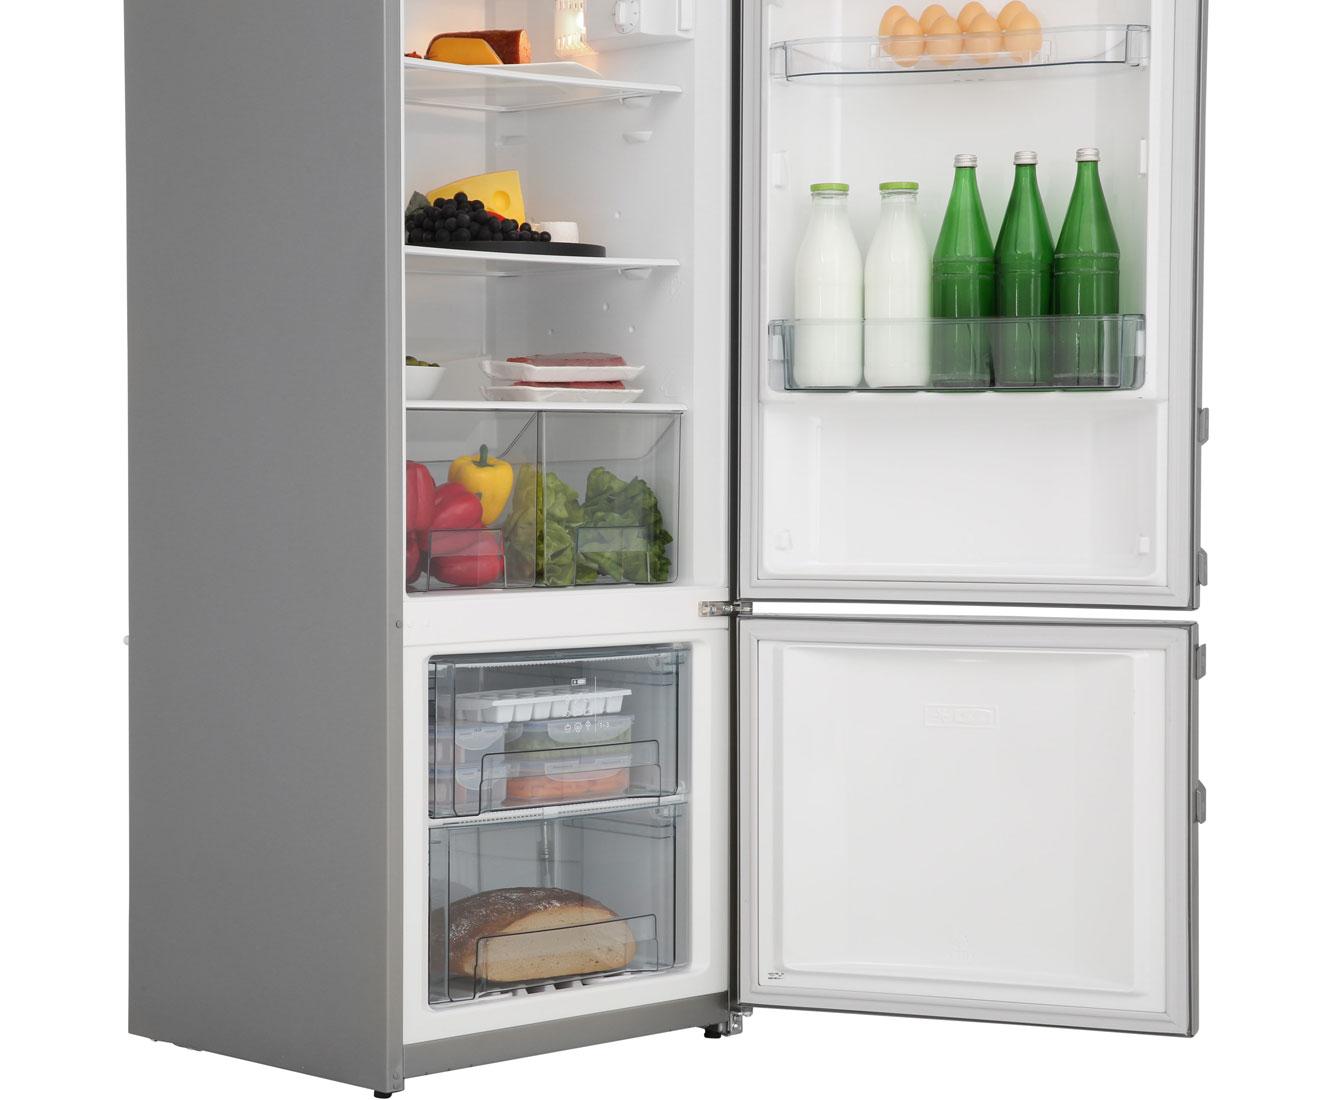 Gorenje Kühlschrank Probleme : Gorenje rk r kühl gefrierkombination er breite bordeaux